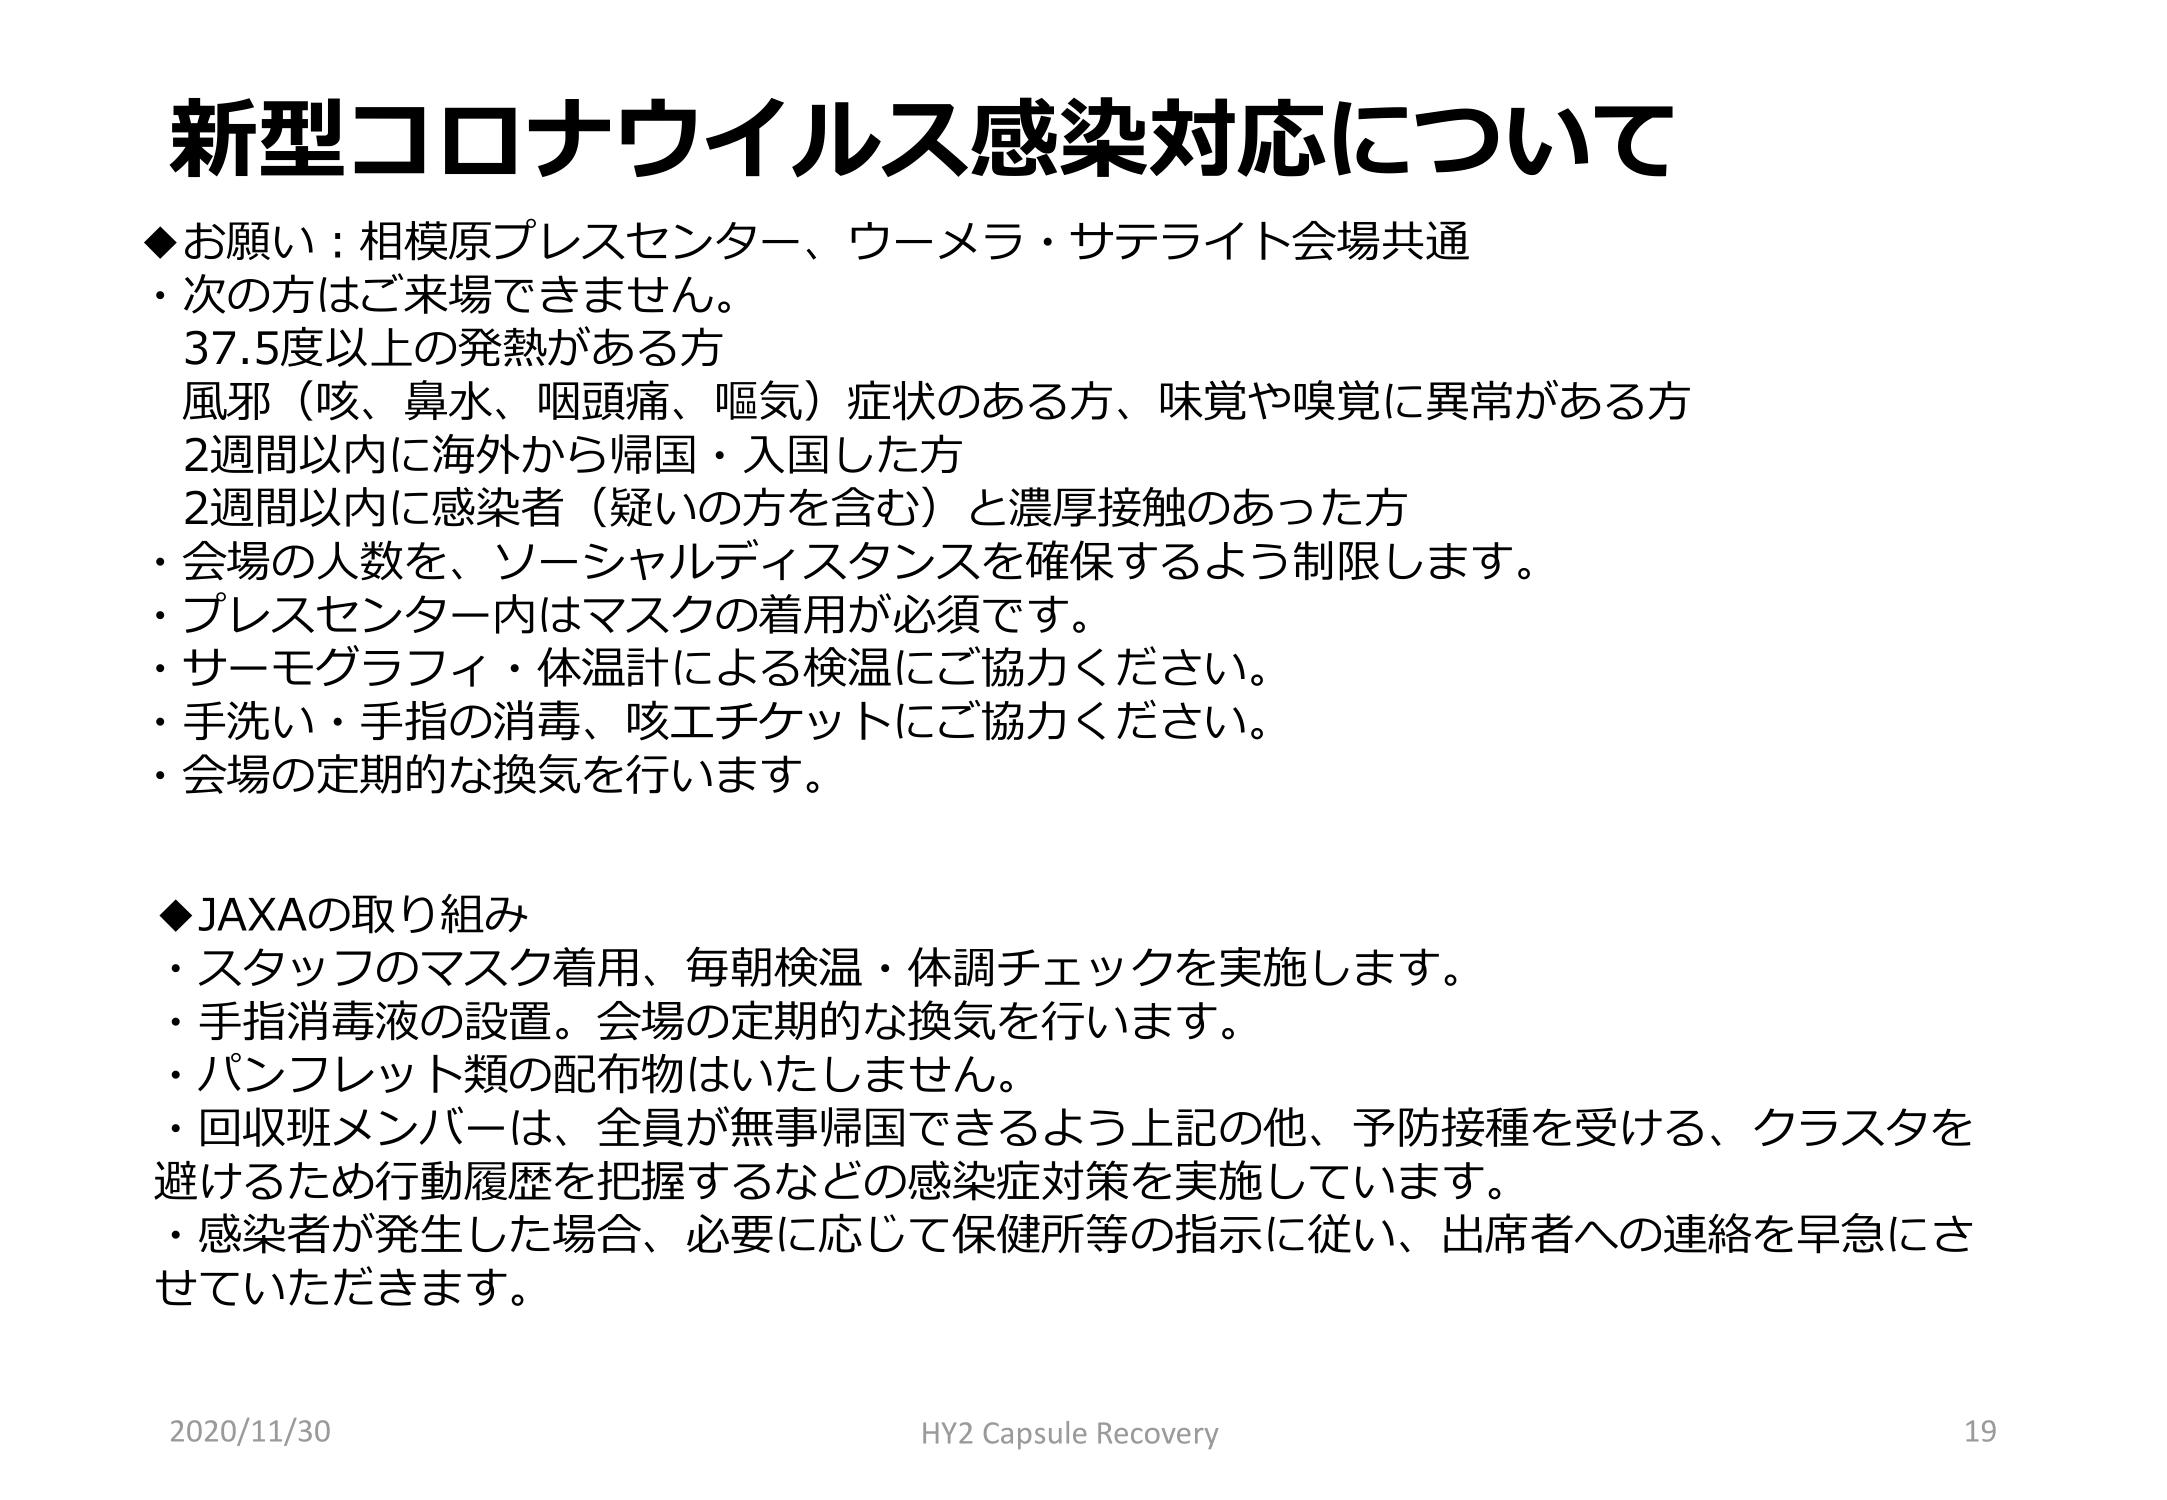 f:id:Imamura:20201130154520p:plain:h250